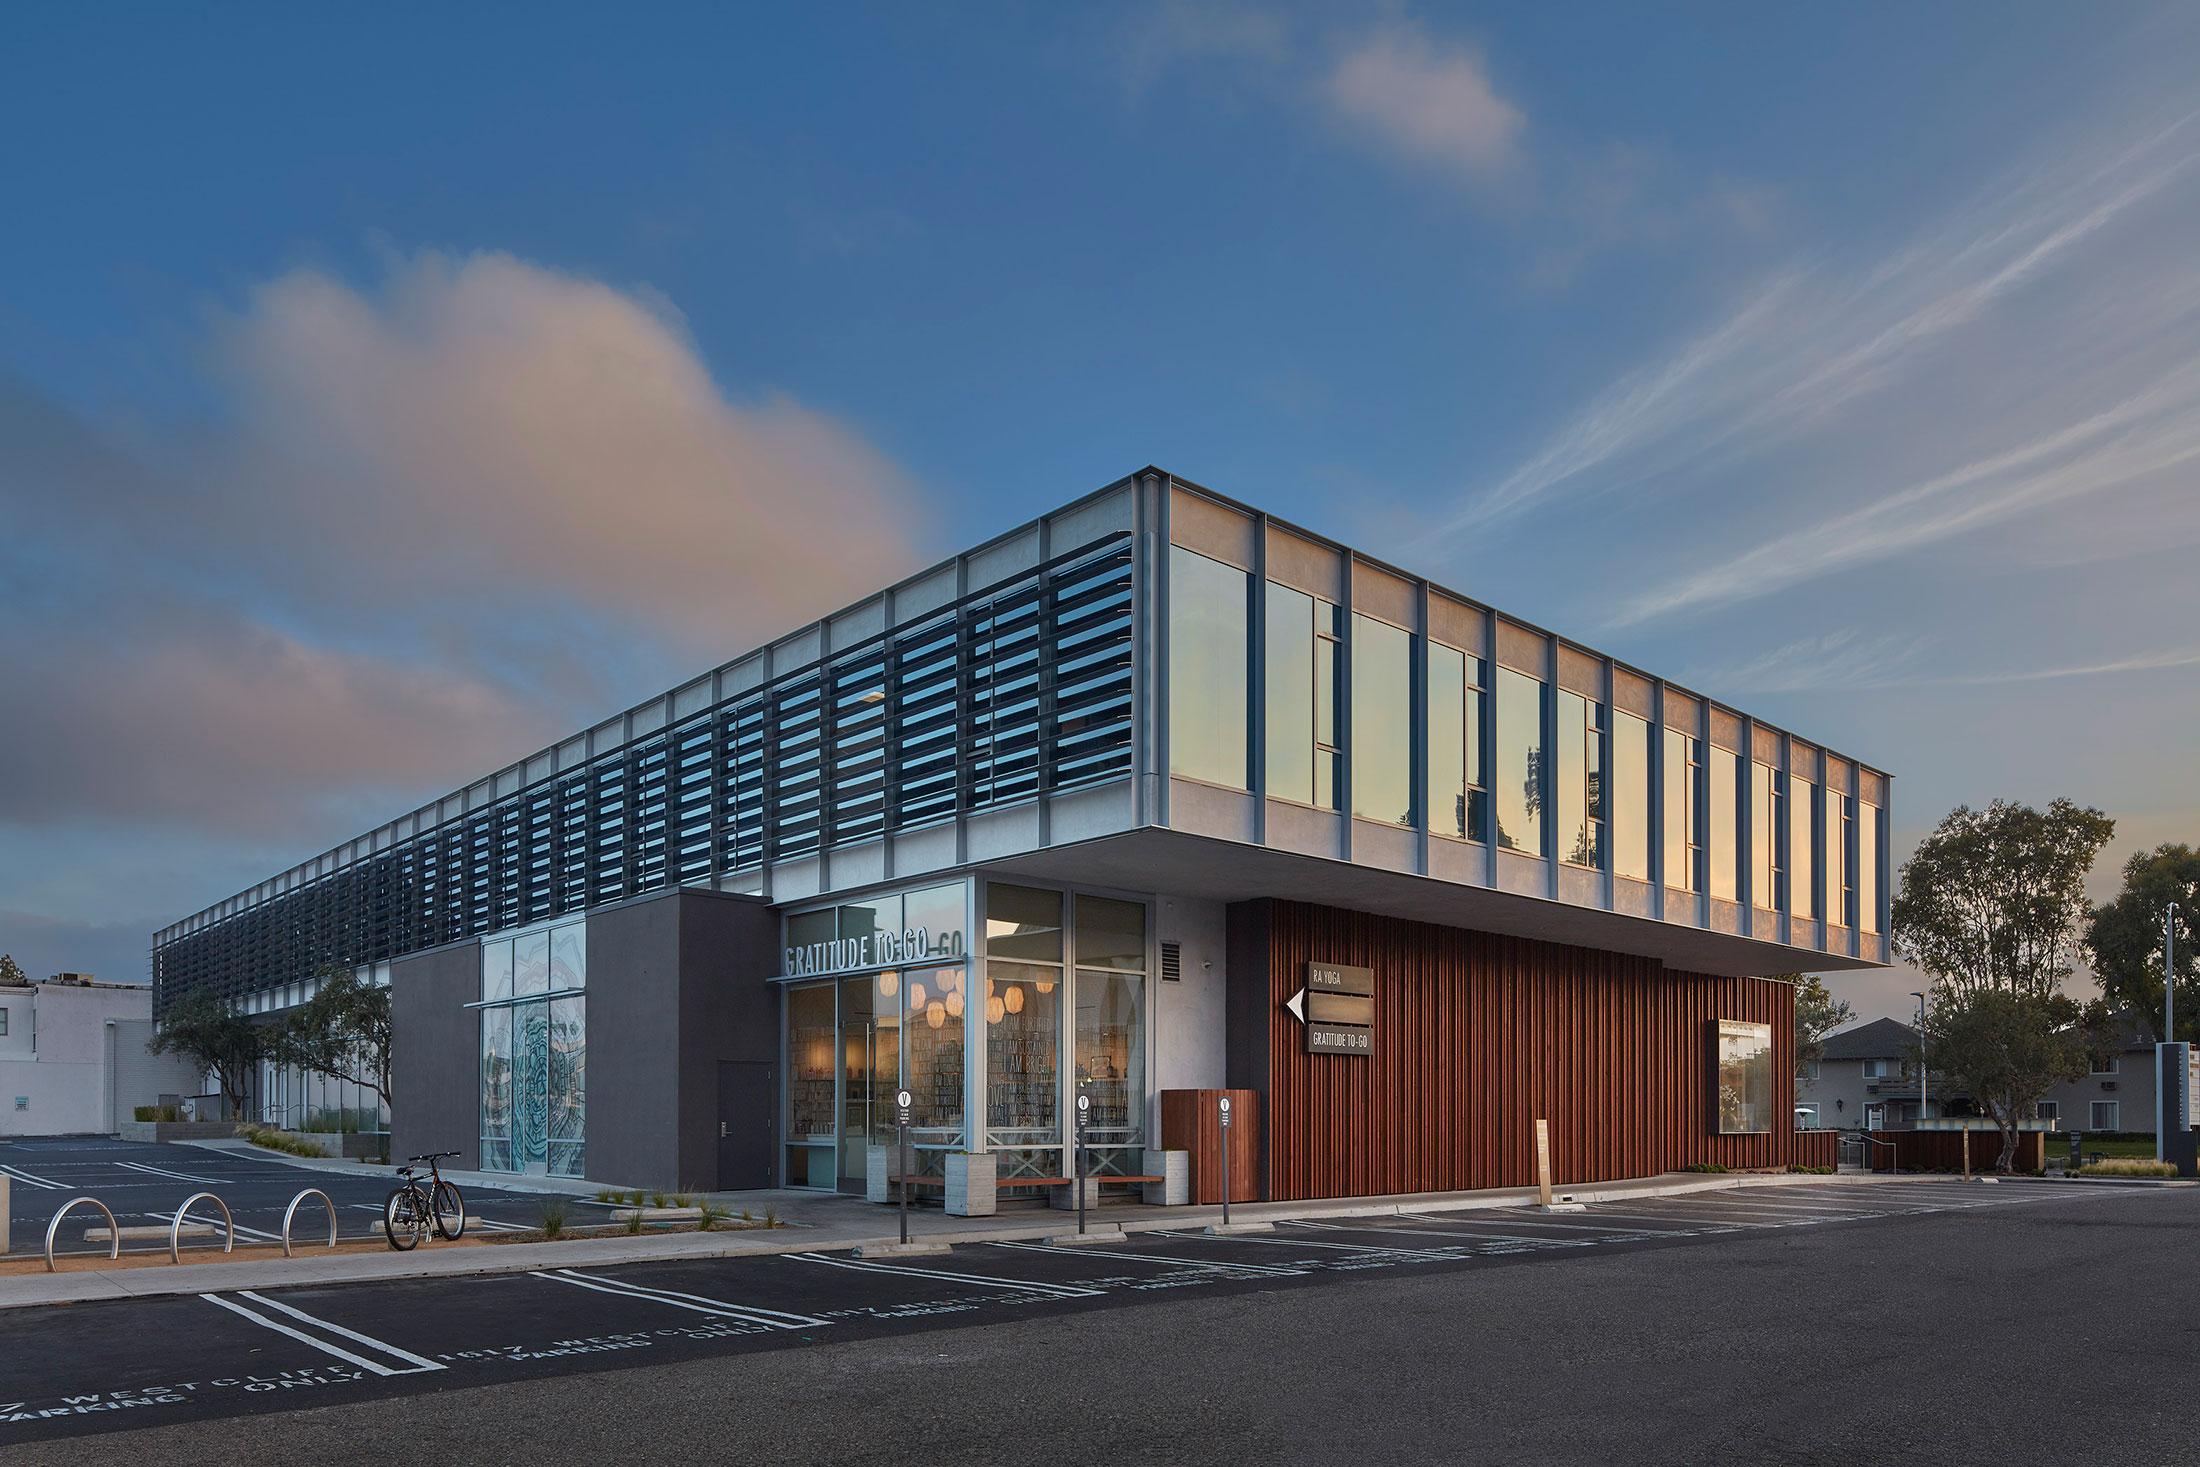 modern-architecture-building-mixed-use-sustainable-shubindonaldson-castaway-commons-2